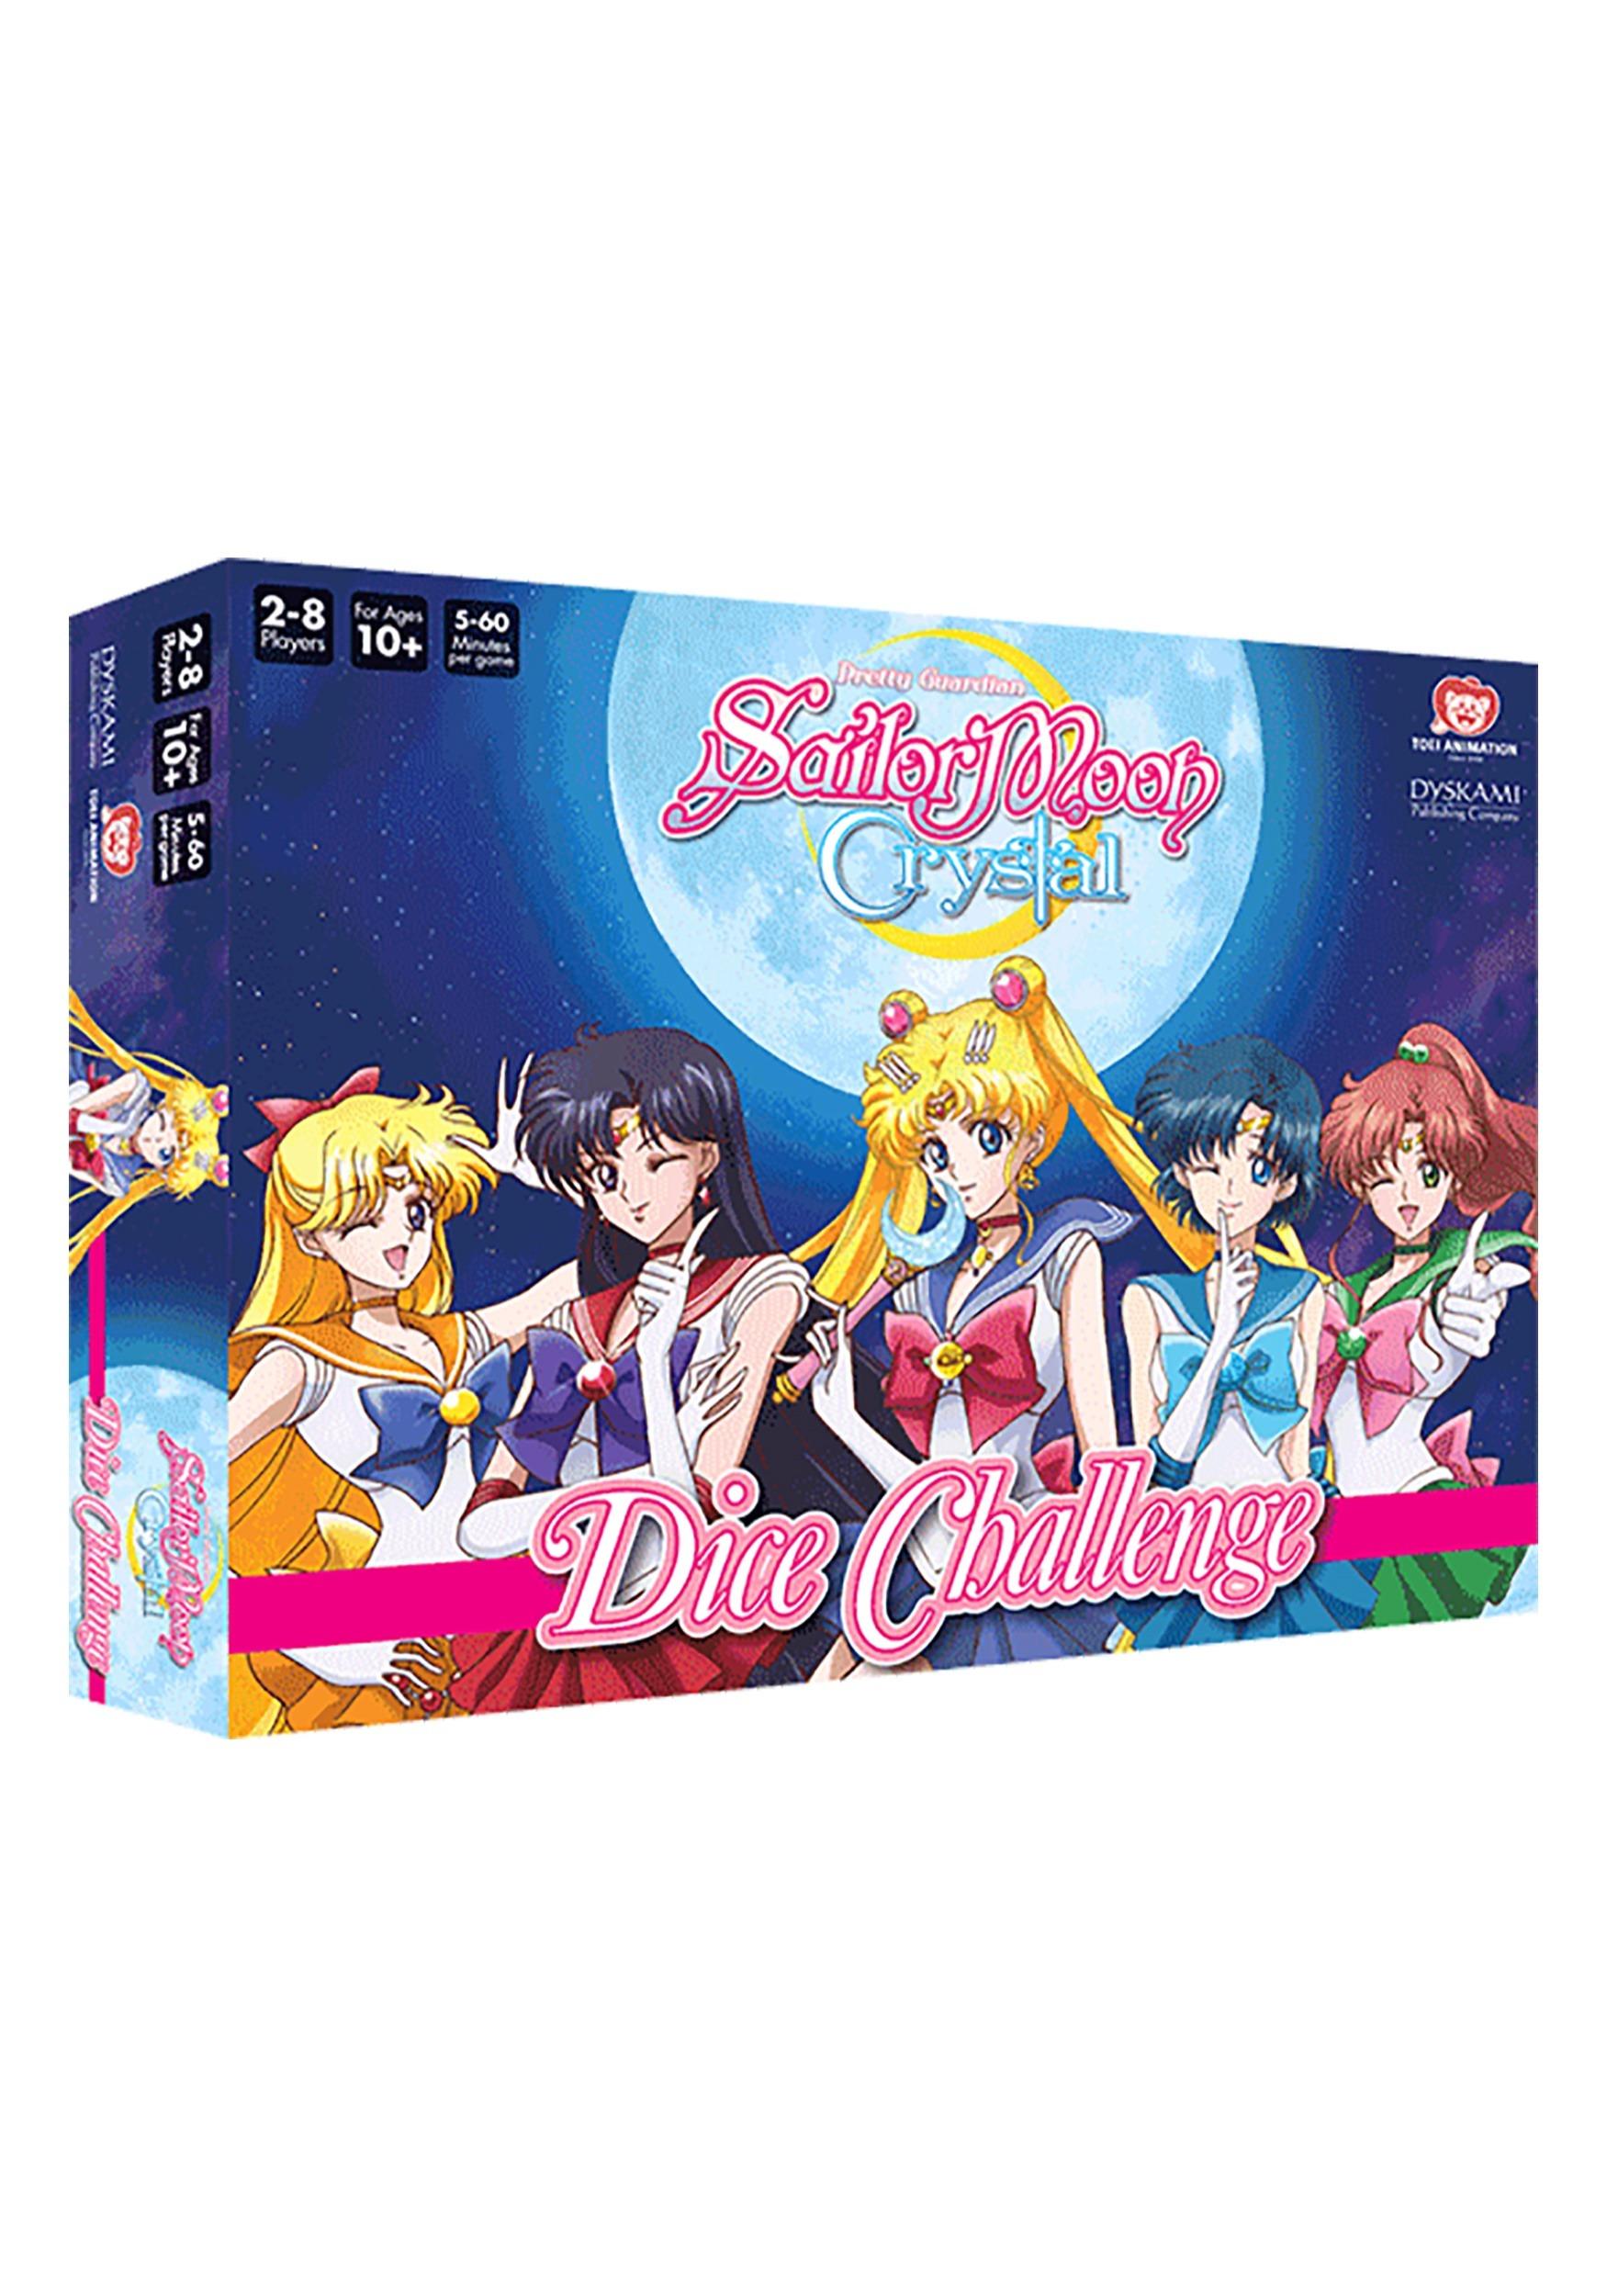 Sailor_Moon_Crystal:_Dice_Challenge_Game